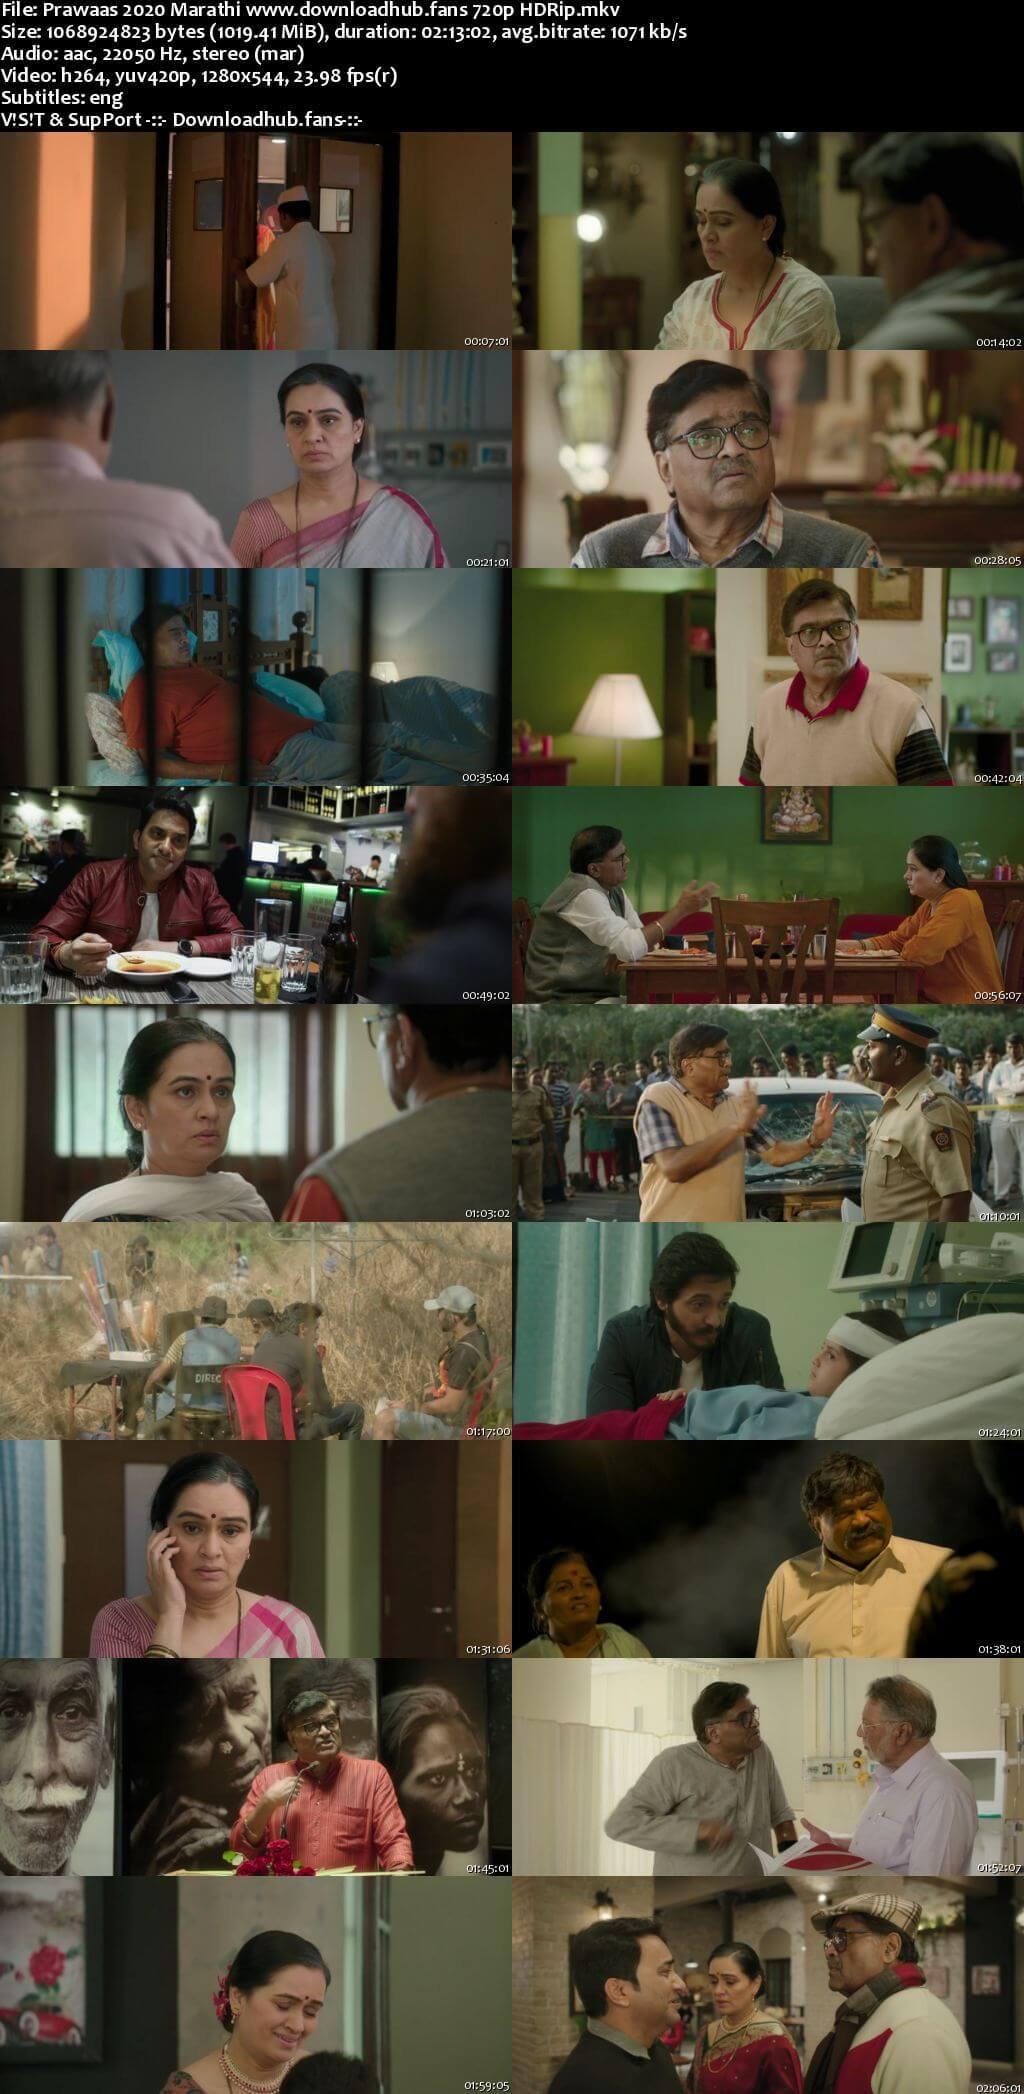 Prawaas 2020 Marathi 720p HDRip ESubs